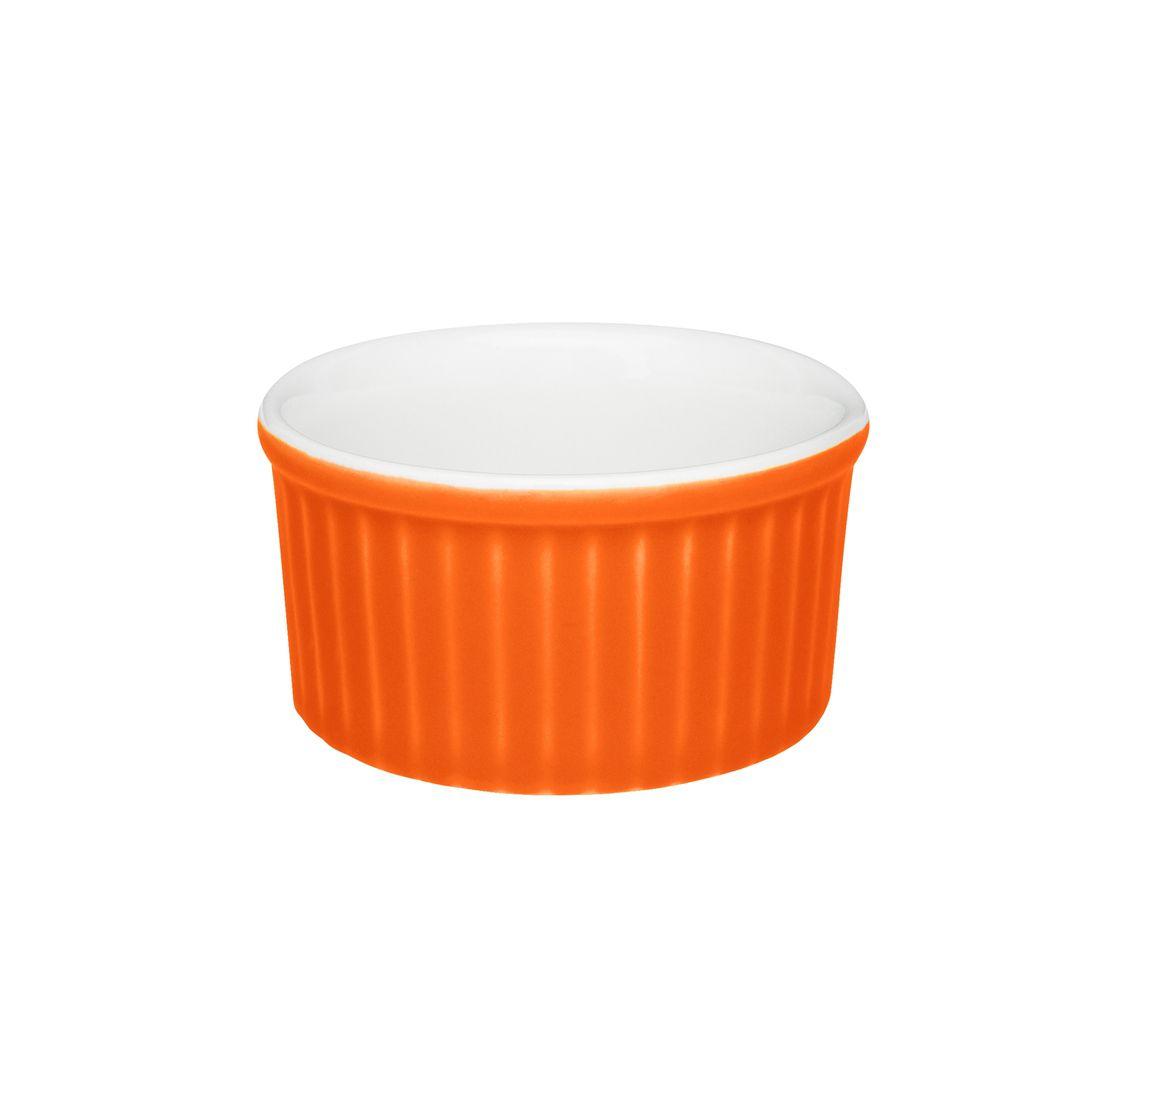 Tigela Ramequin 8X4Cm 100Ml - Branco/Laranja - Oxford Cookware